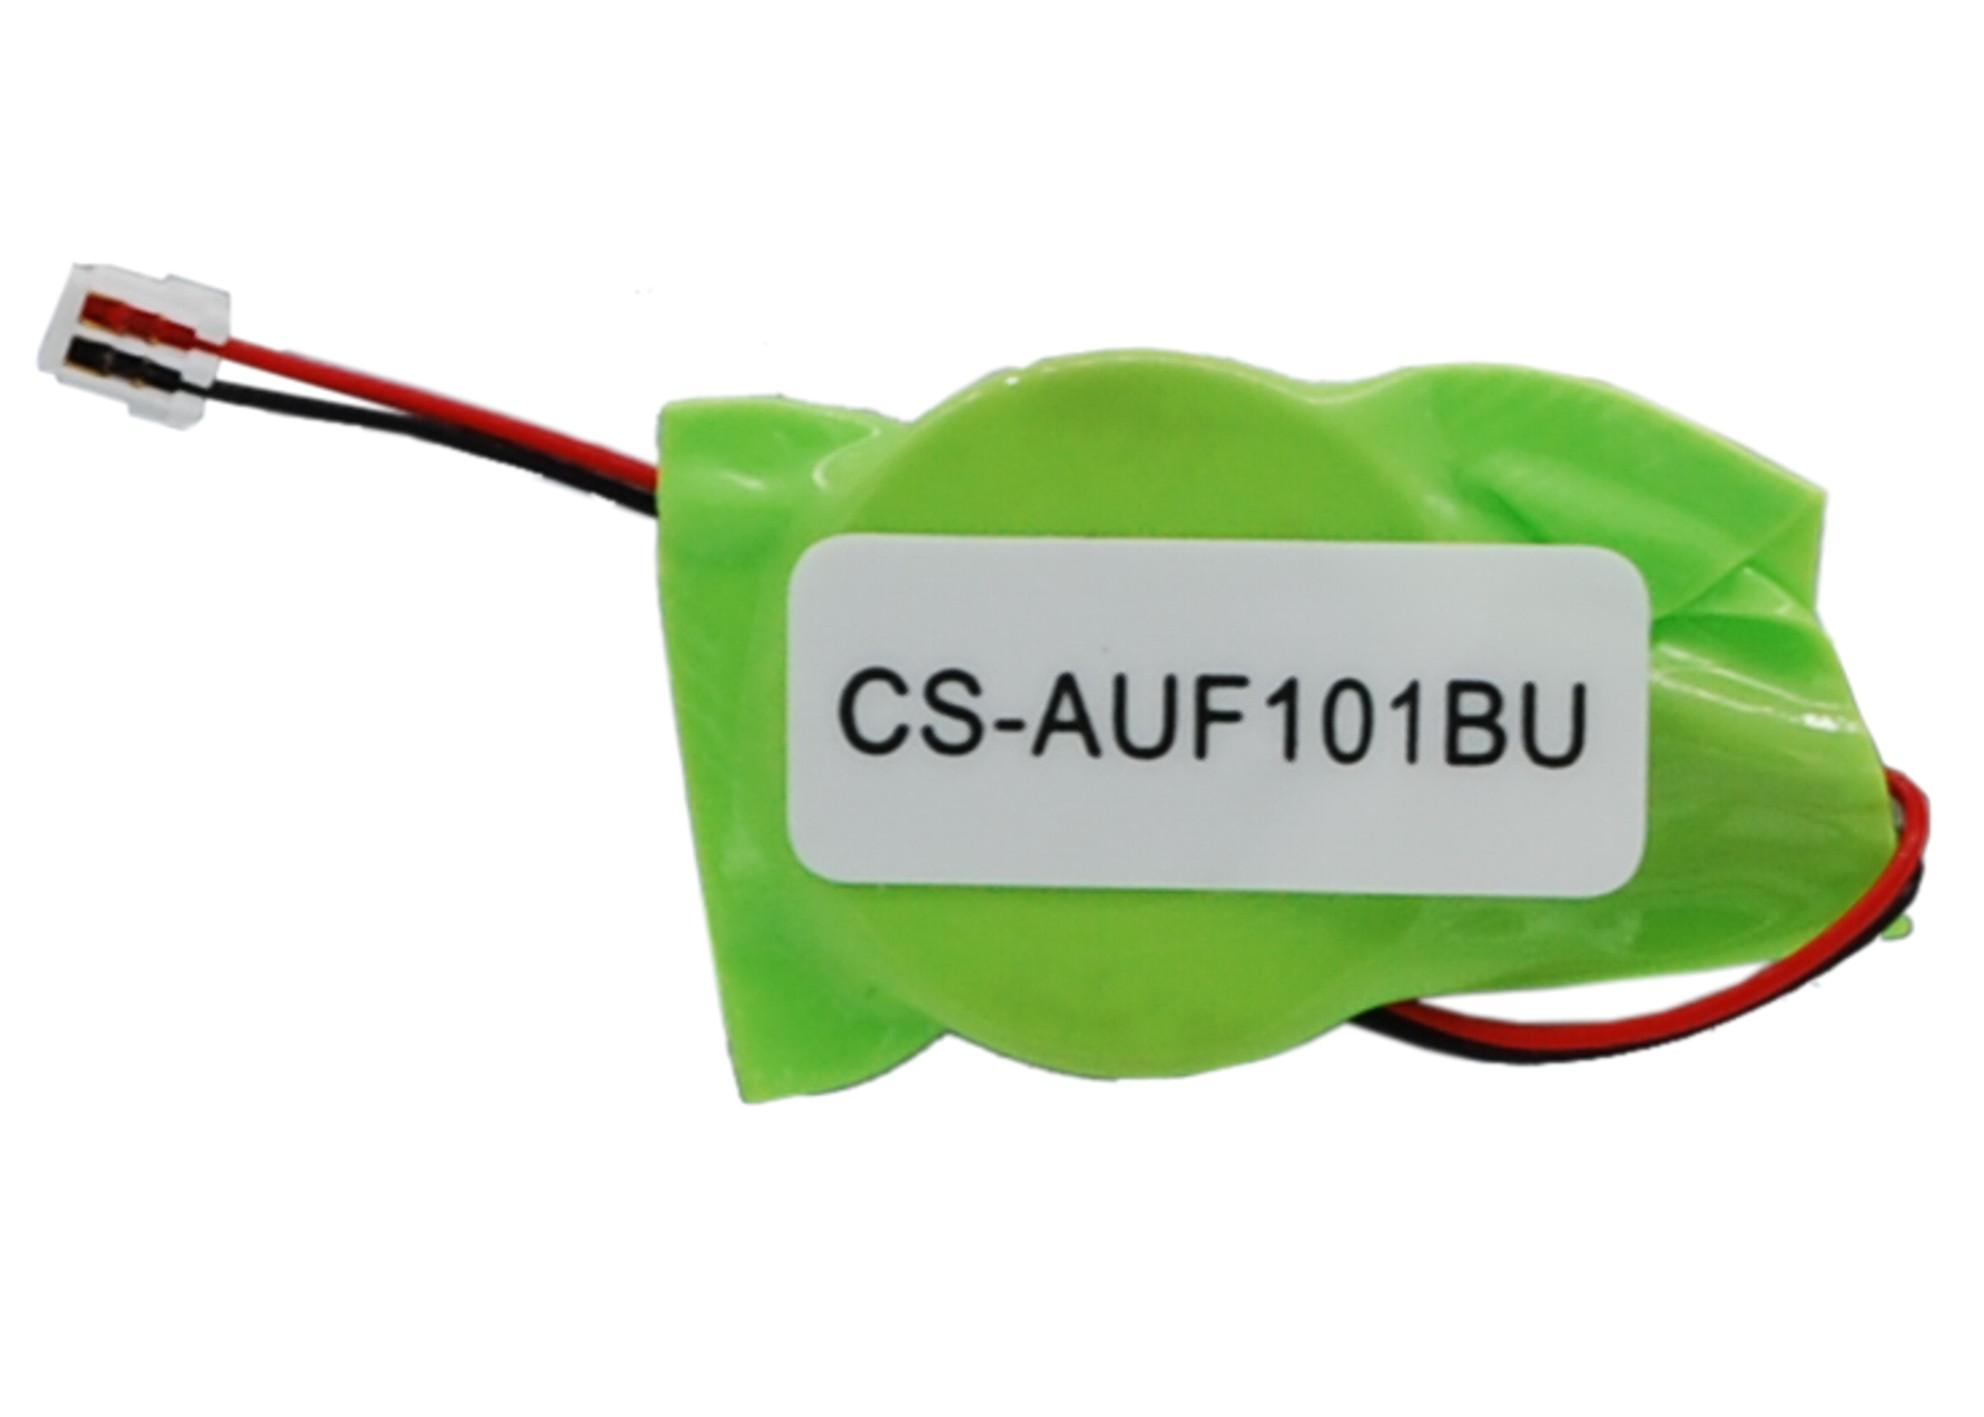 Cameron Sino baterie cmos pro ASUS Eee Pad Transformer TF101-1B047A 3V Li-ion 40mAh zelená - neoriginální